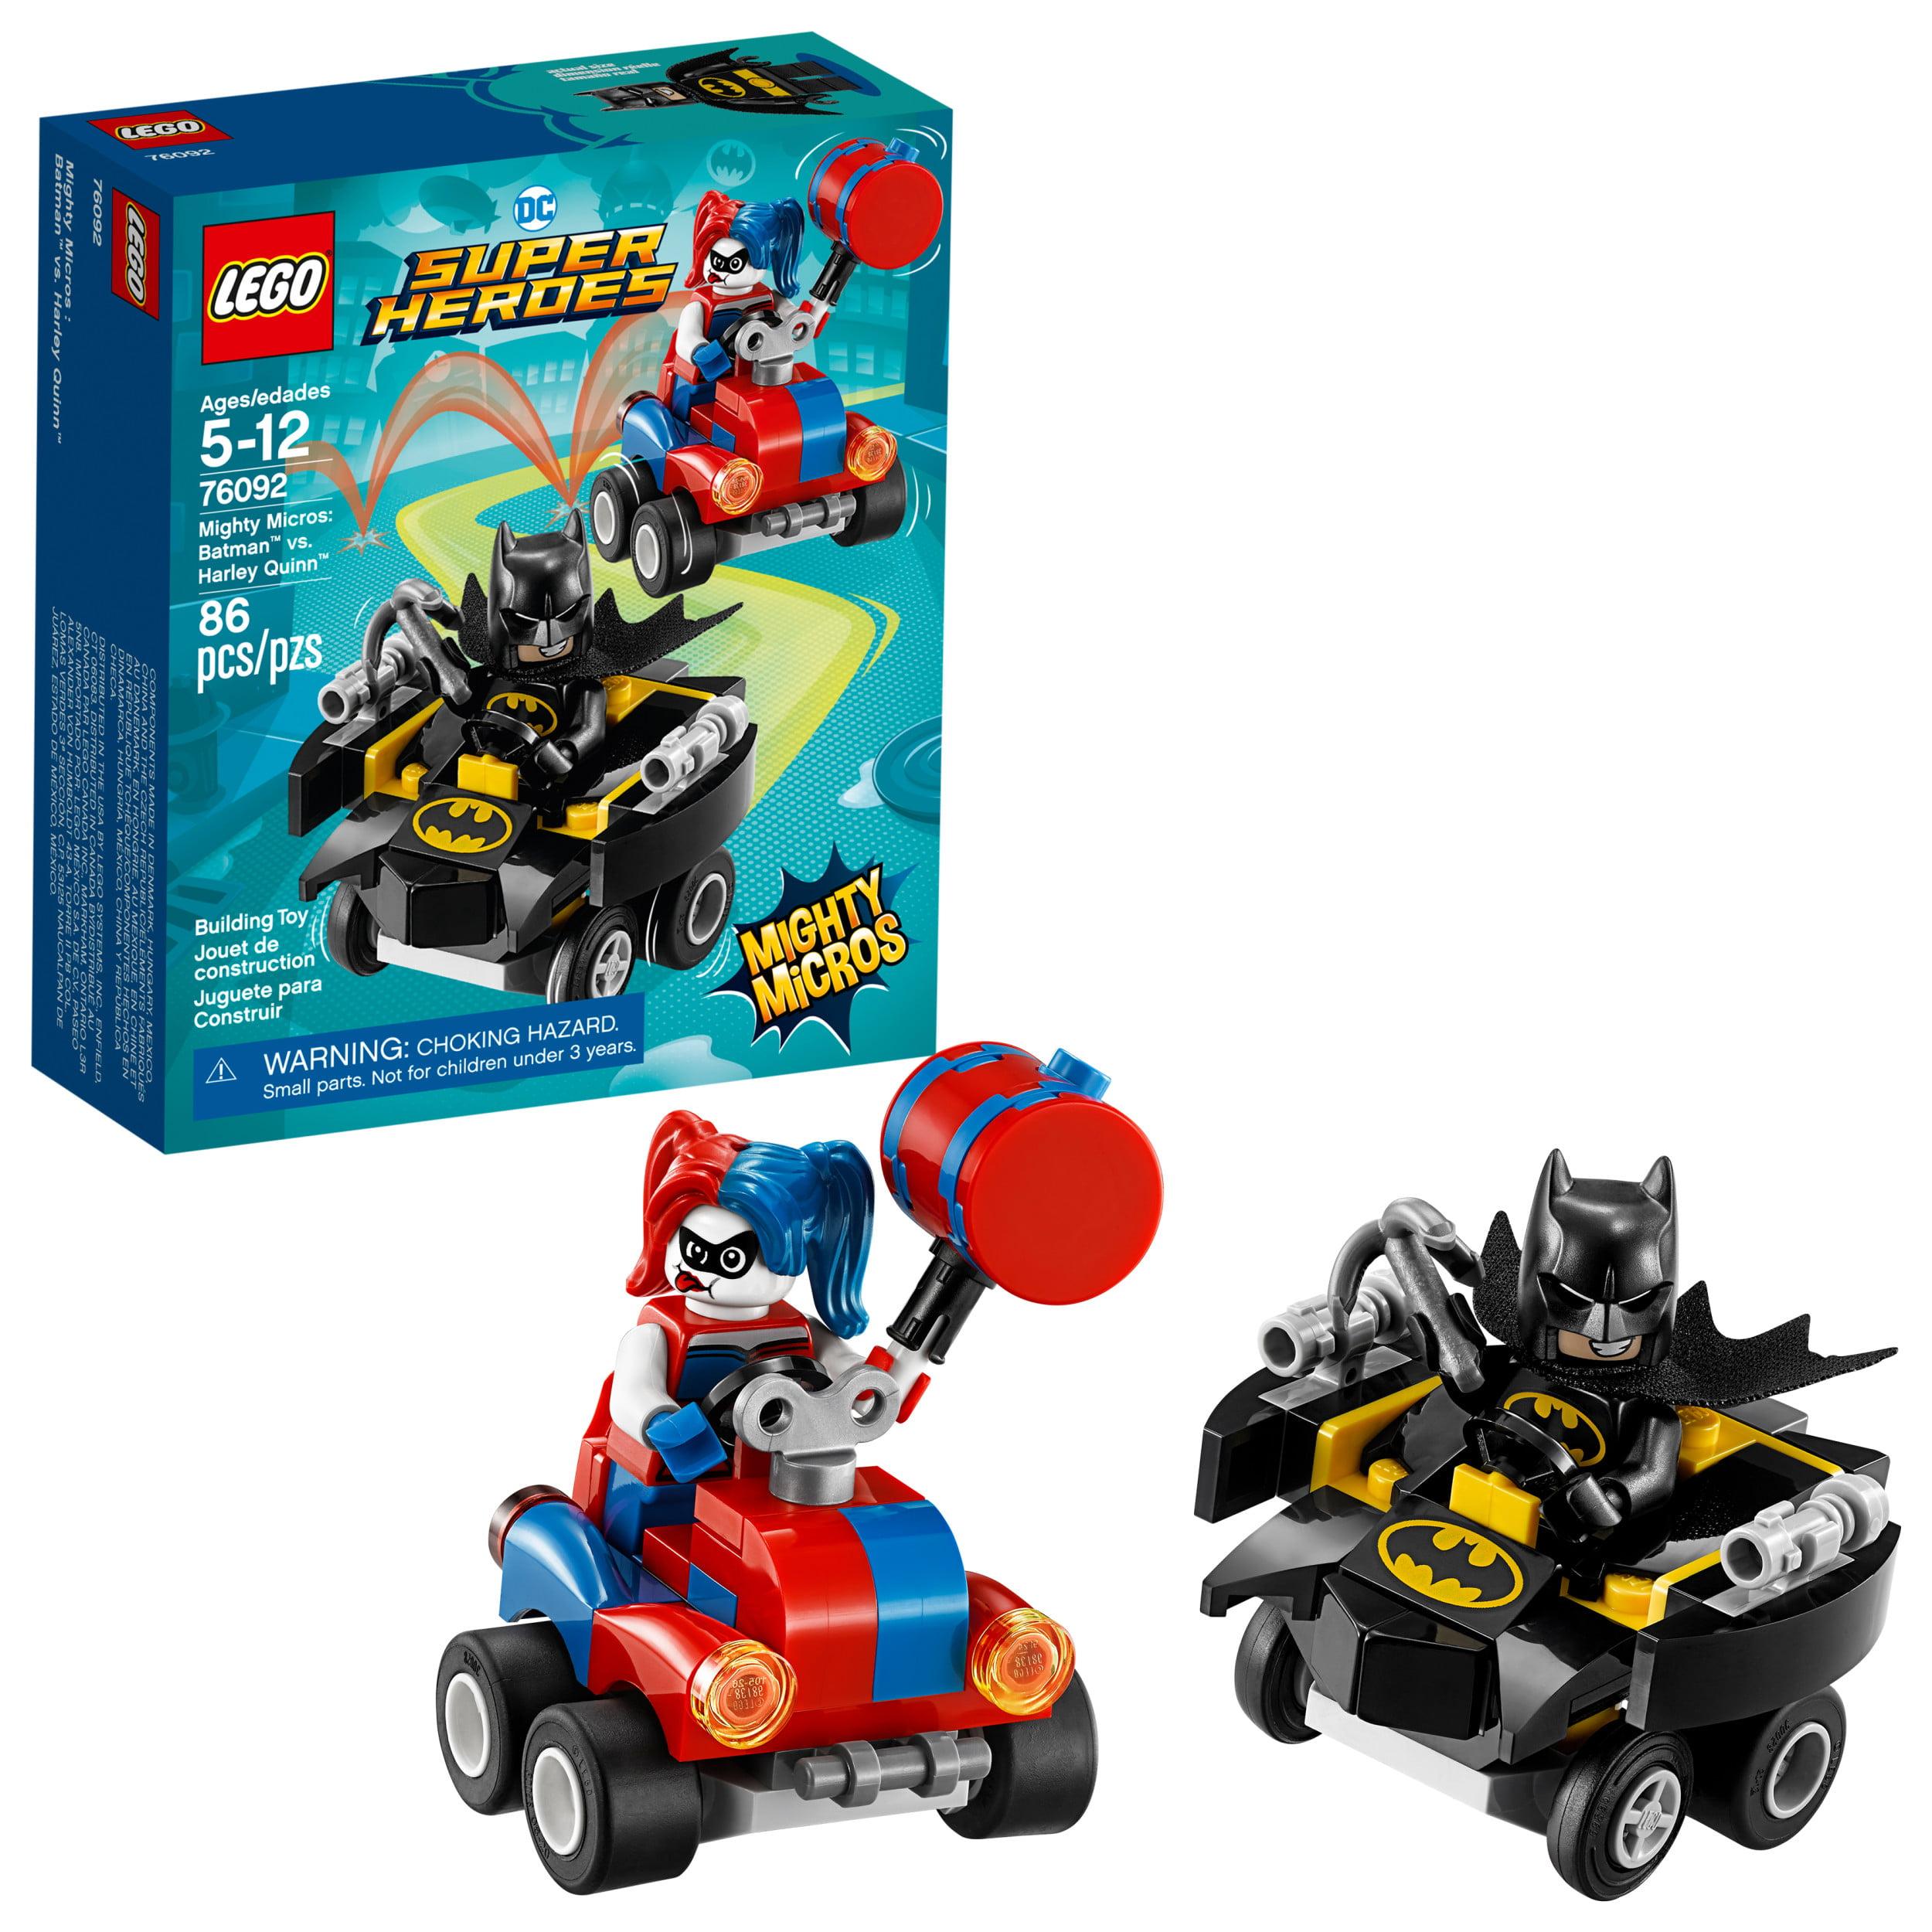 LEGO Super Heroes Mighty Micros: Batman vs. Harley Quinn 76092